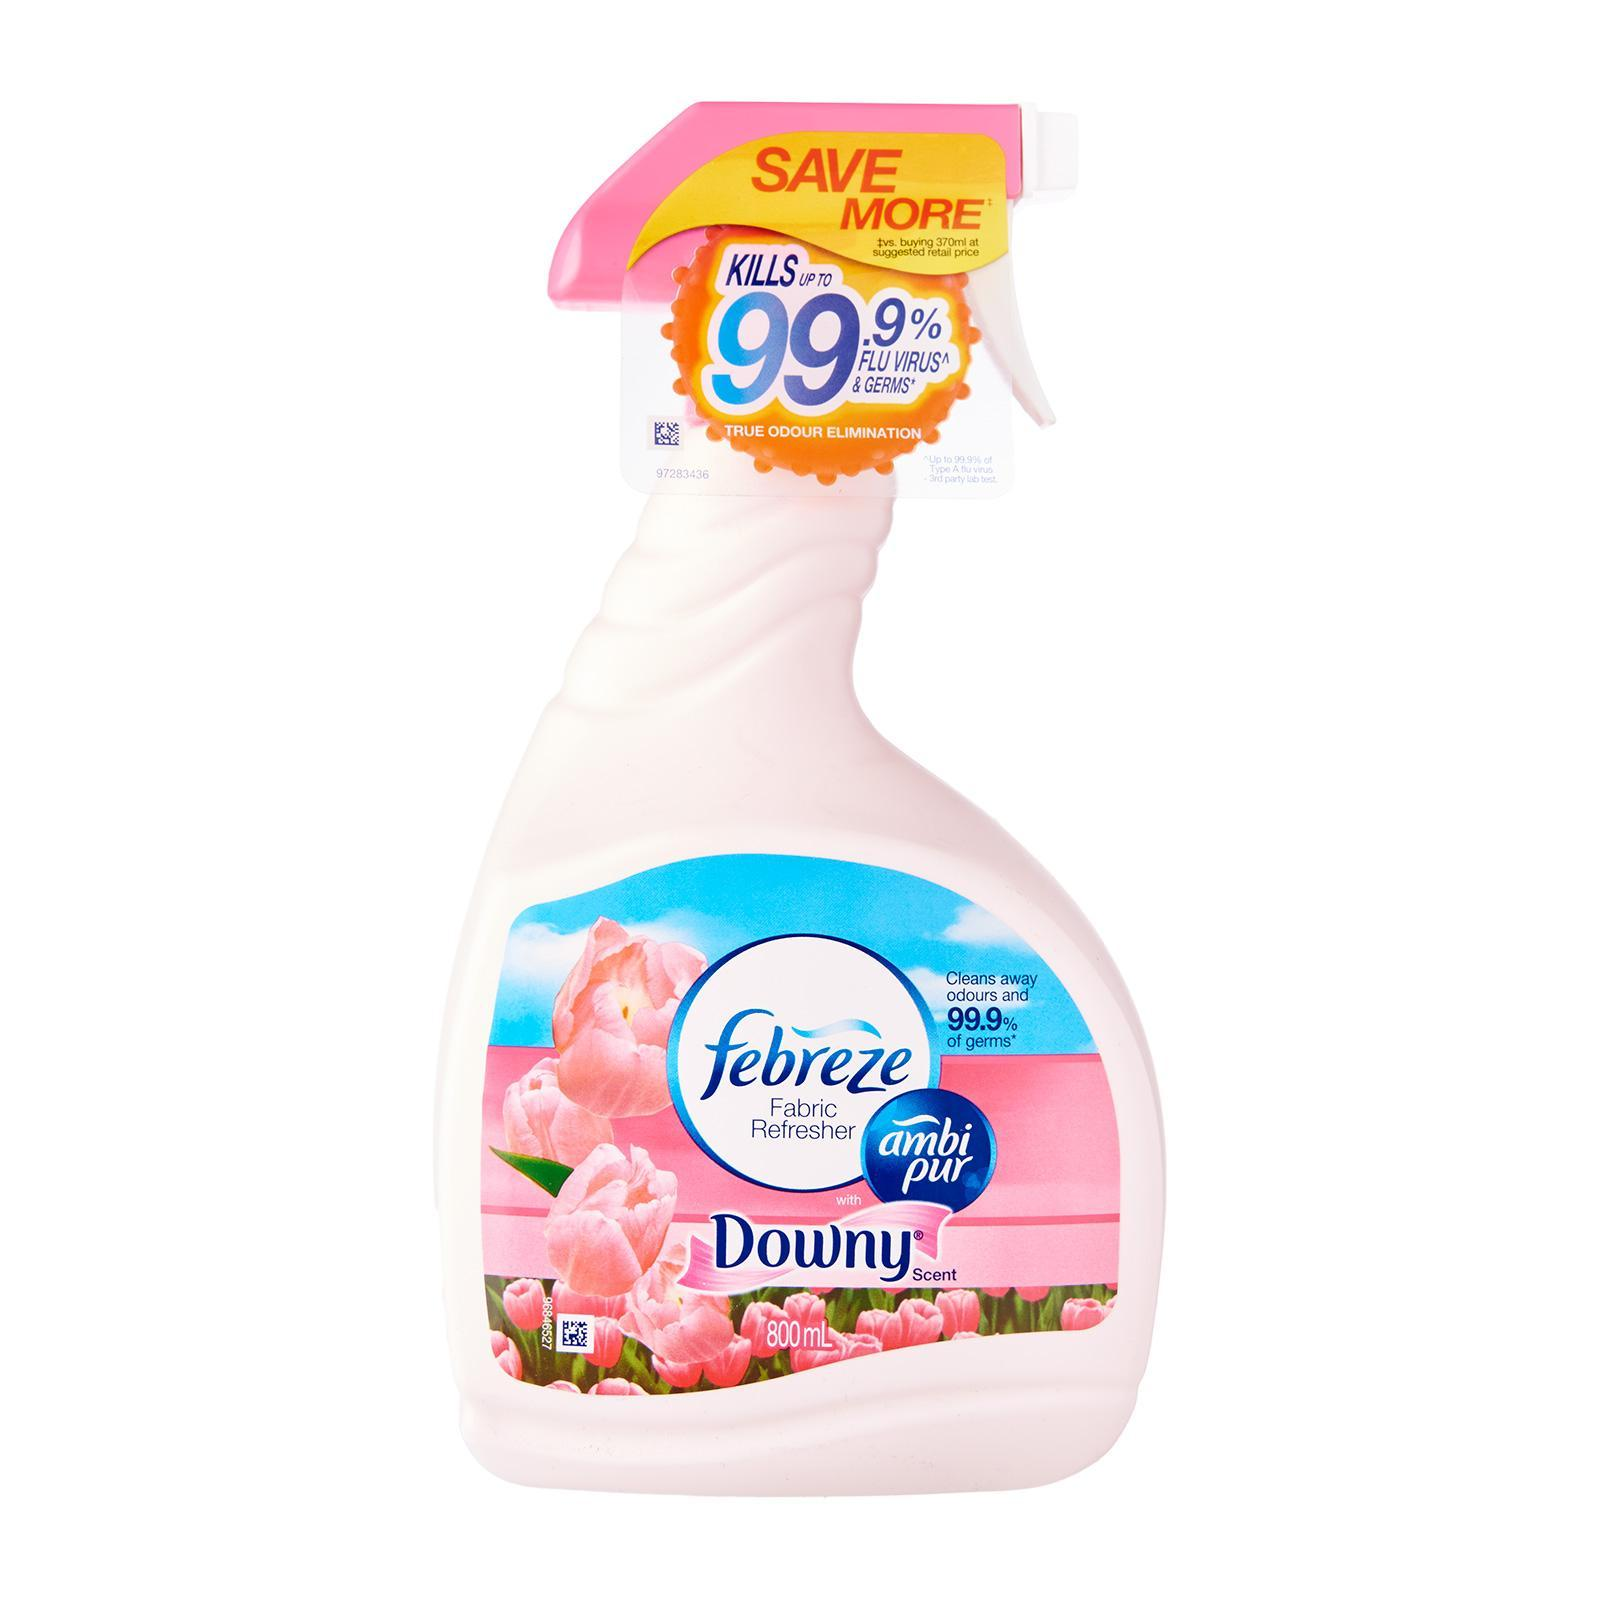 FEBREZE Fabric Refresher Spray Downy Scent 800ml